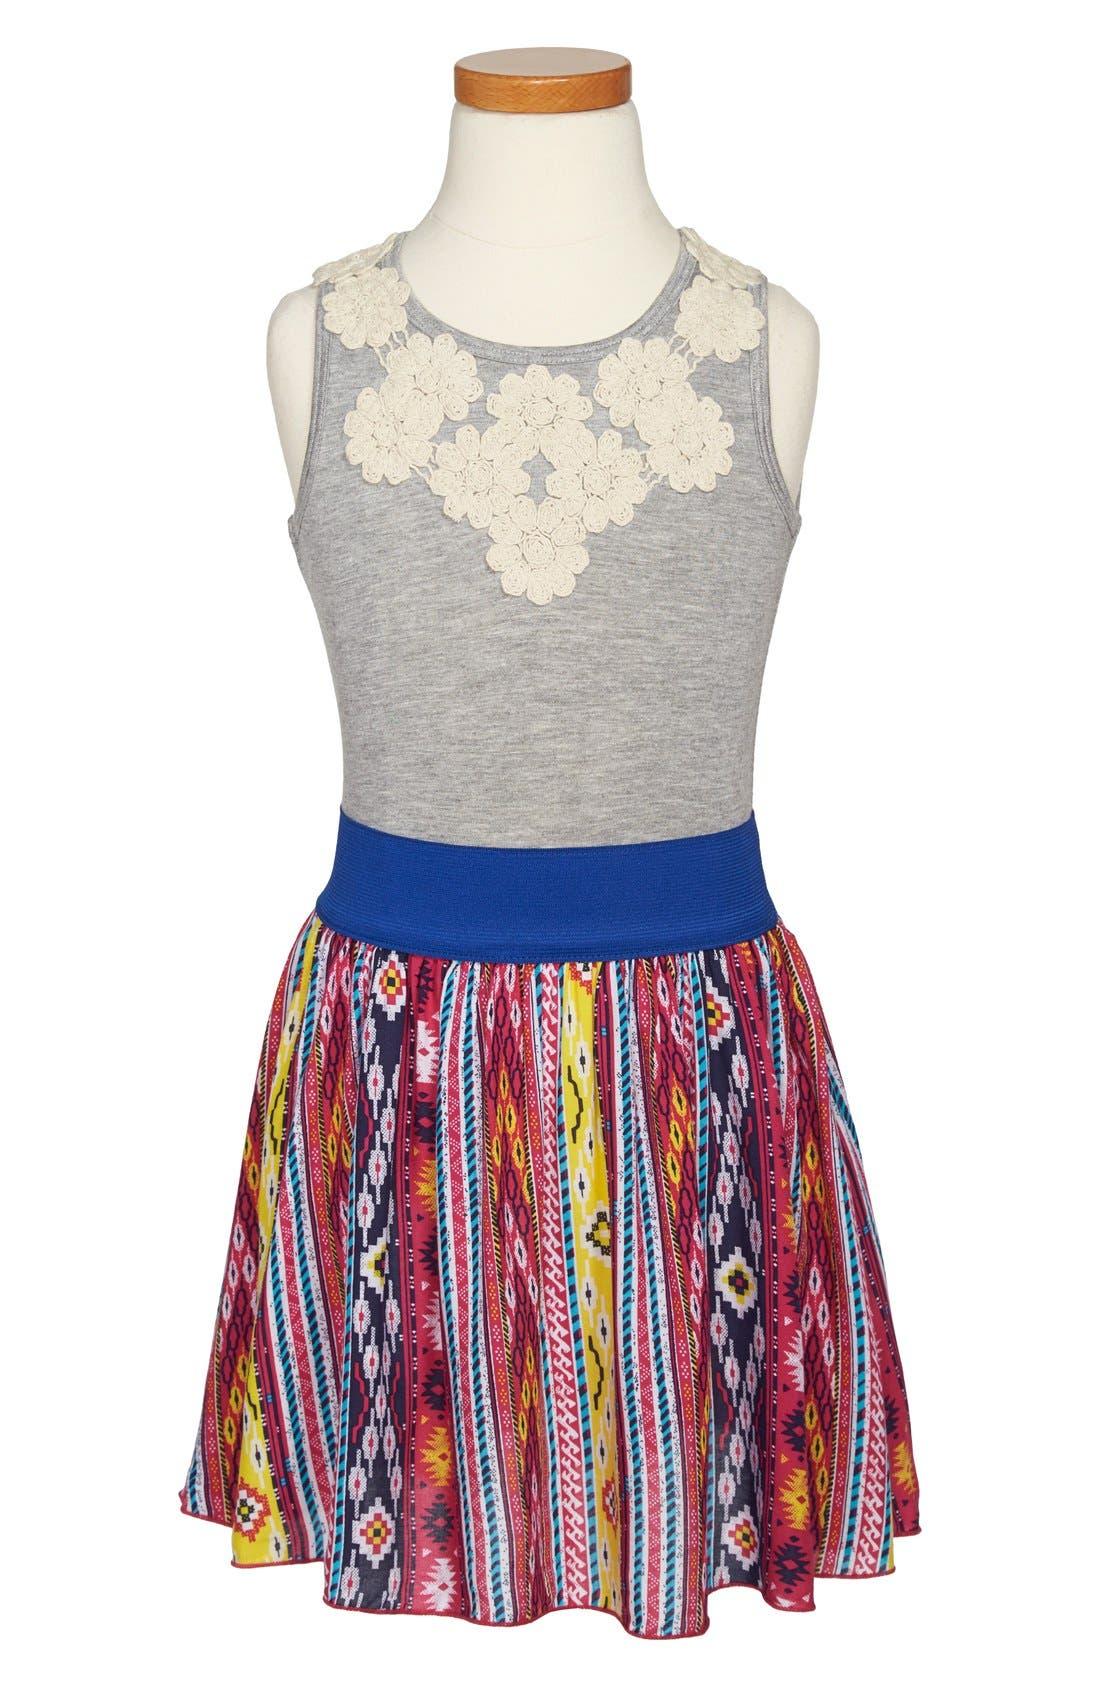 Alternate Image 1 Selected - Twirls & Twigs 'Cluney' Sleeveless Dress (Little Girls & Big Girls)